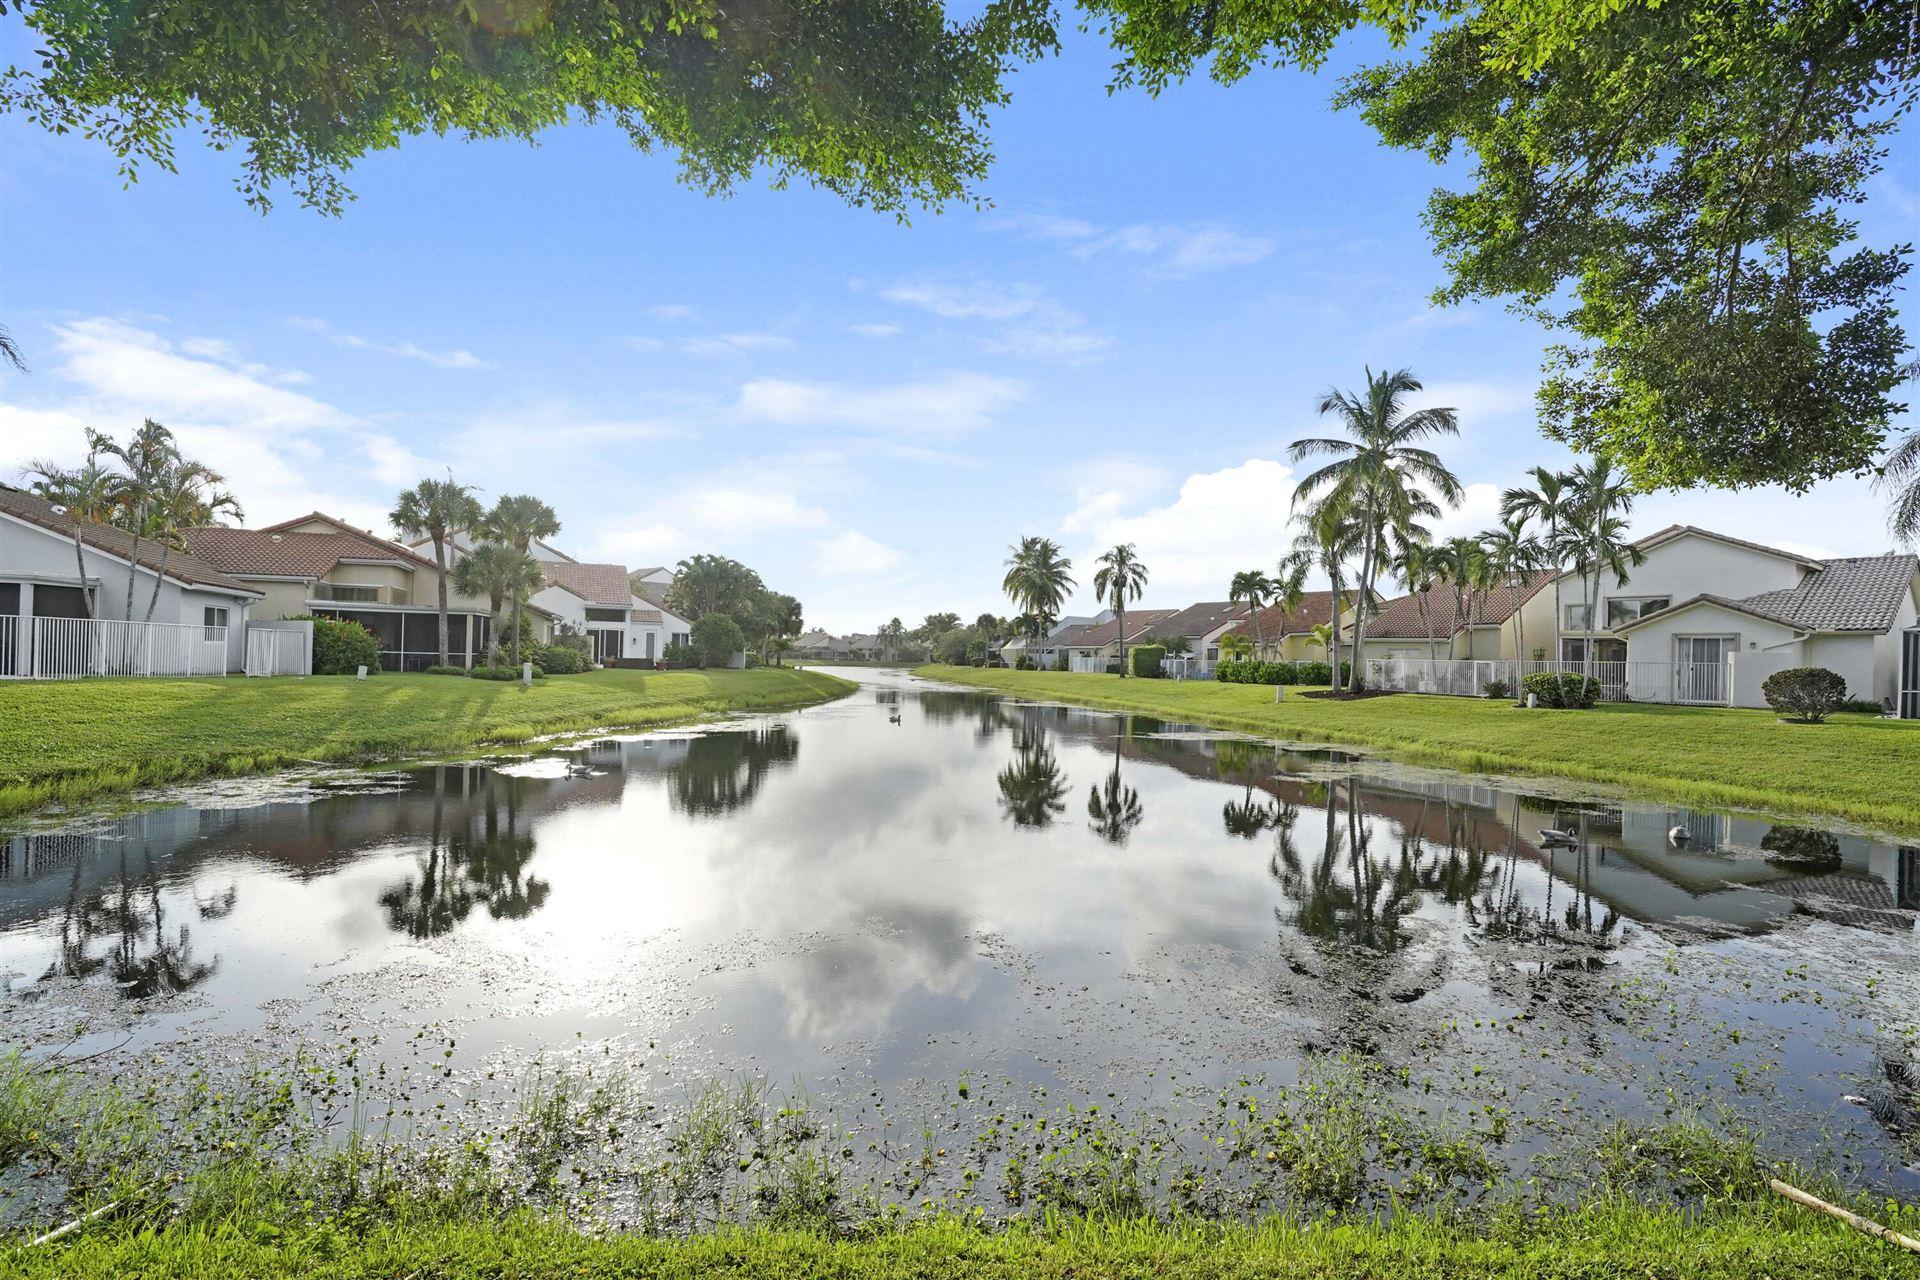 17058 Newport Club Drive, Boca Raton, FL 33496 - MLS#: RX-10751410